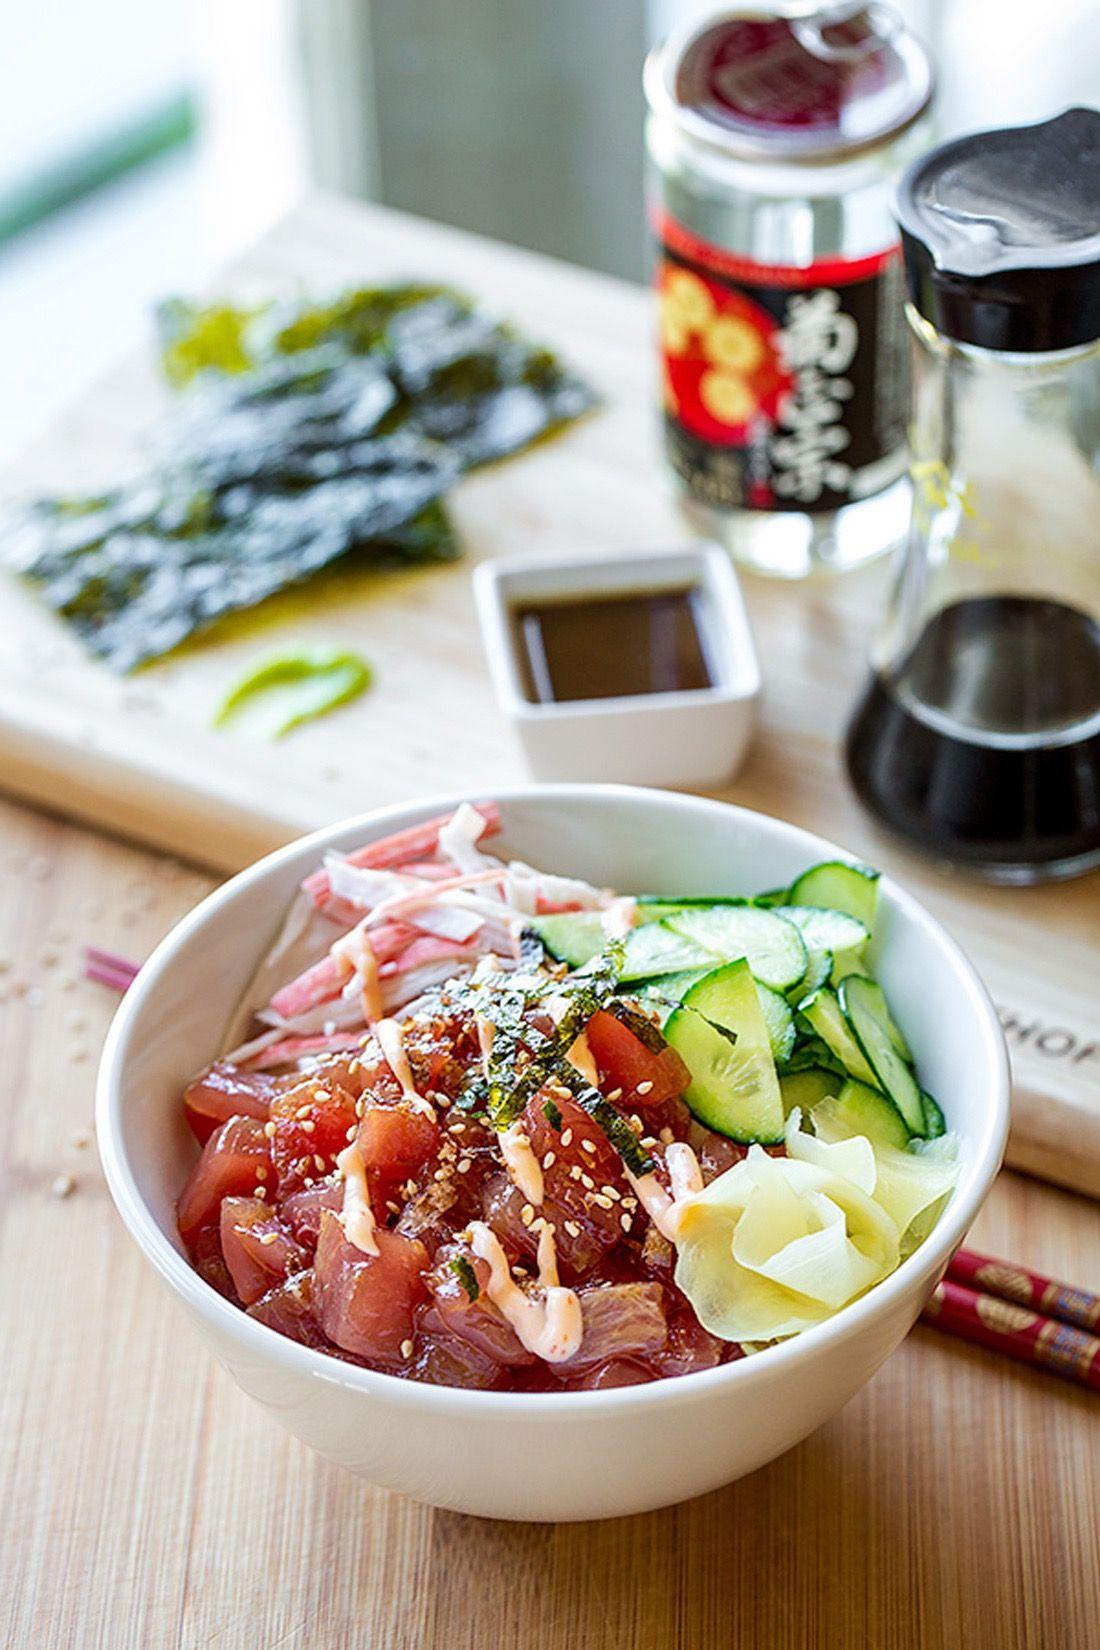 12 Poke Bowl Recipes That Will Transport You Oceanside | Idée souper, Recette, Alimentation